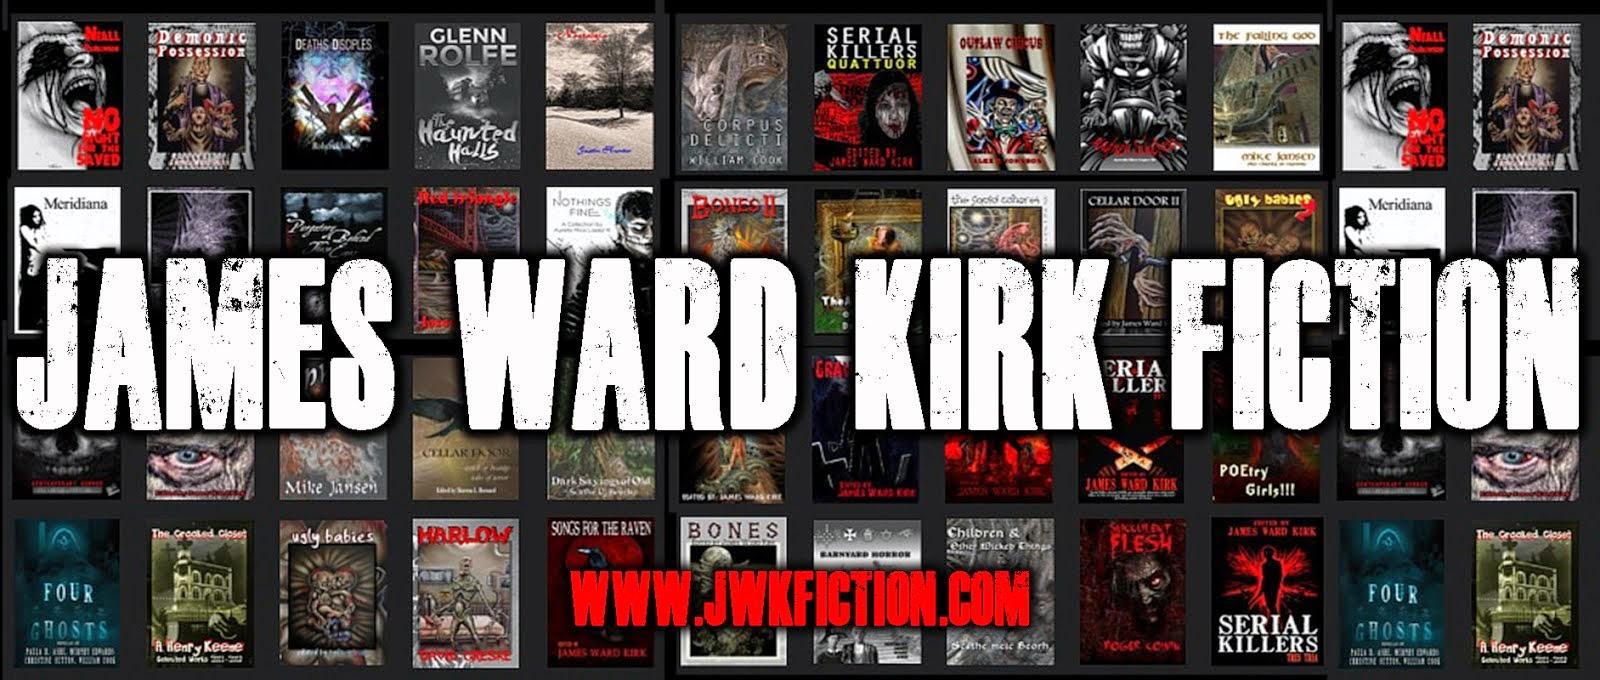 http://jwkfiction.com/